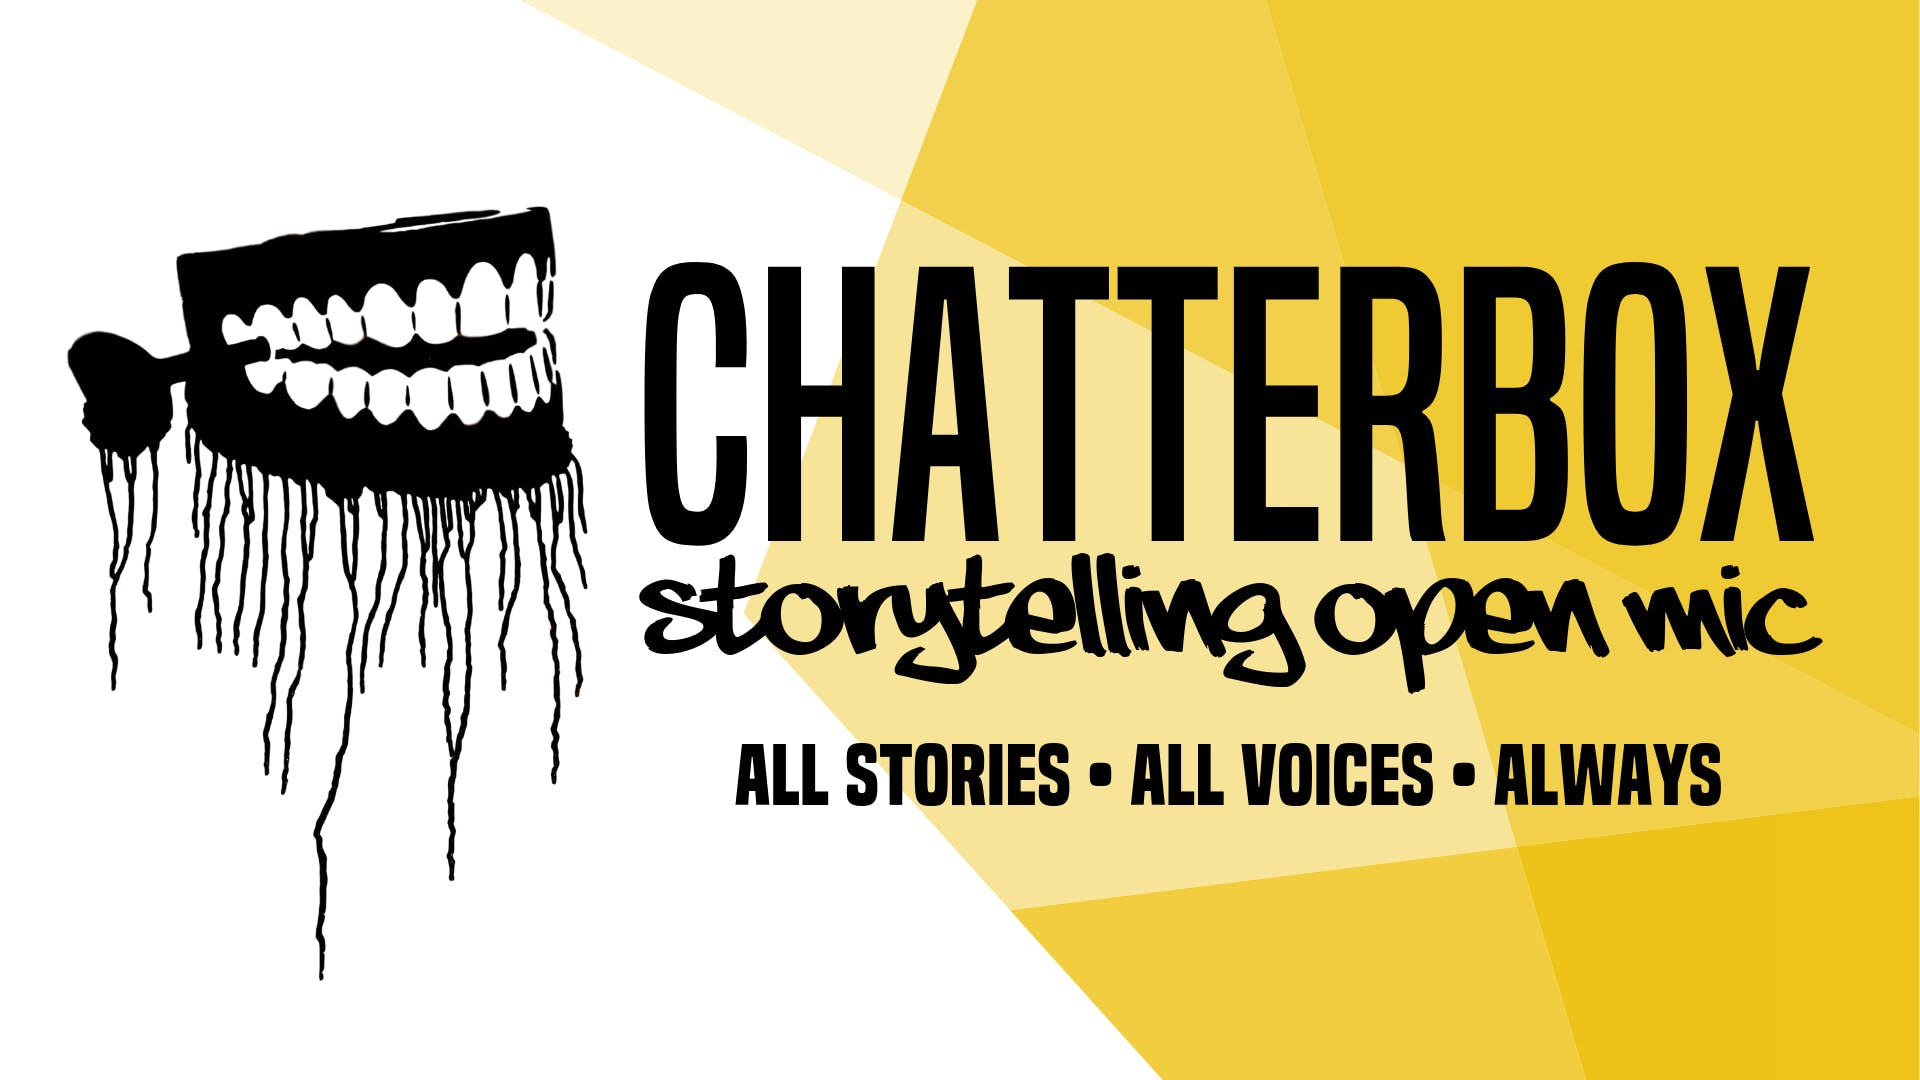 Chatterbox Storytelling Open Mic